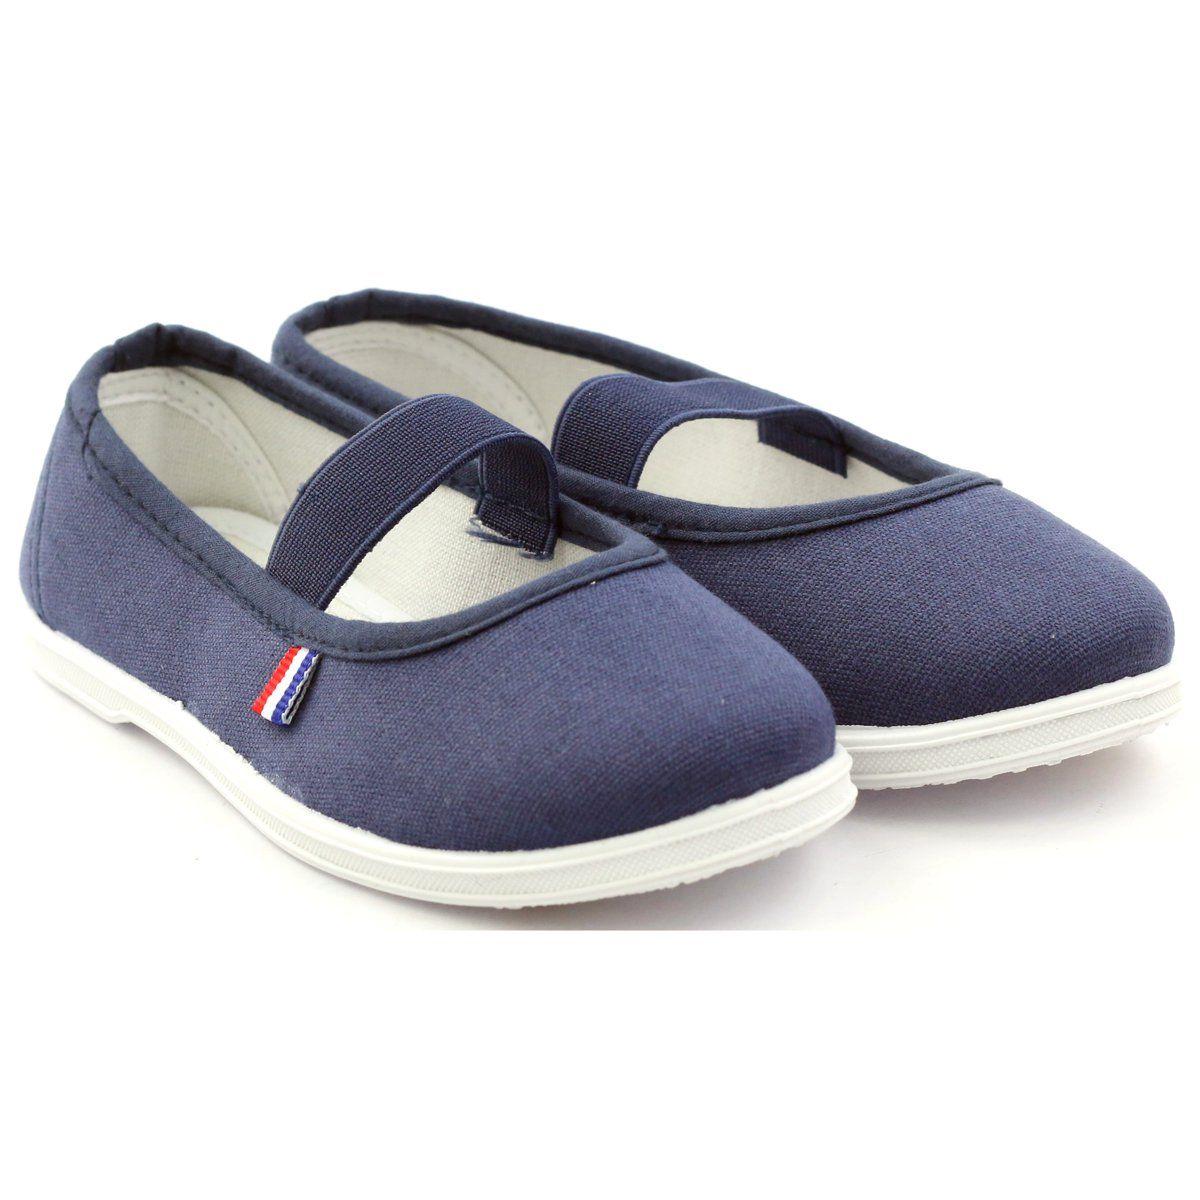 Tenisowki Czeszki Buty Dzieciece American Club Granatowe Childrens Ballet Shoes Childrens Shoes Sneakers